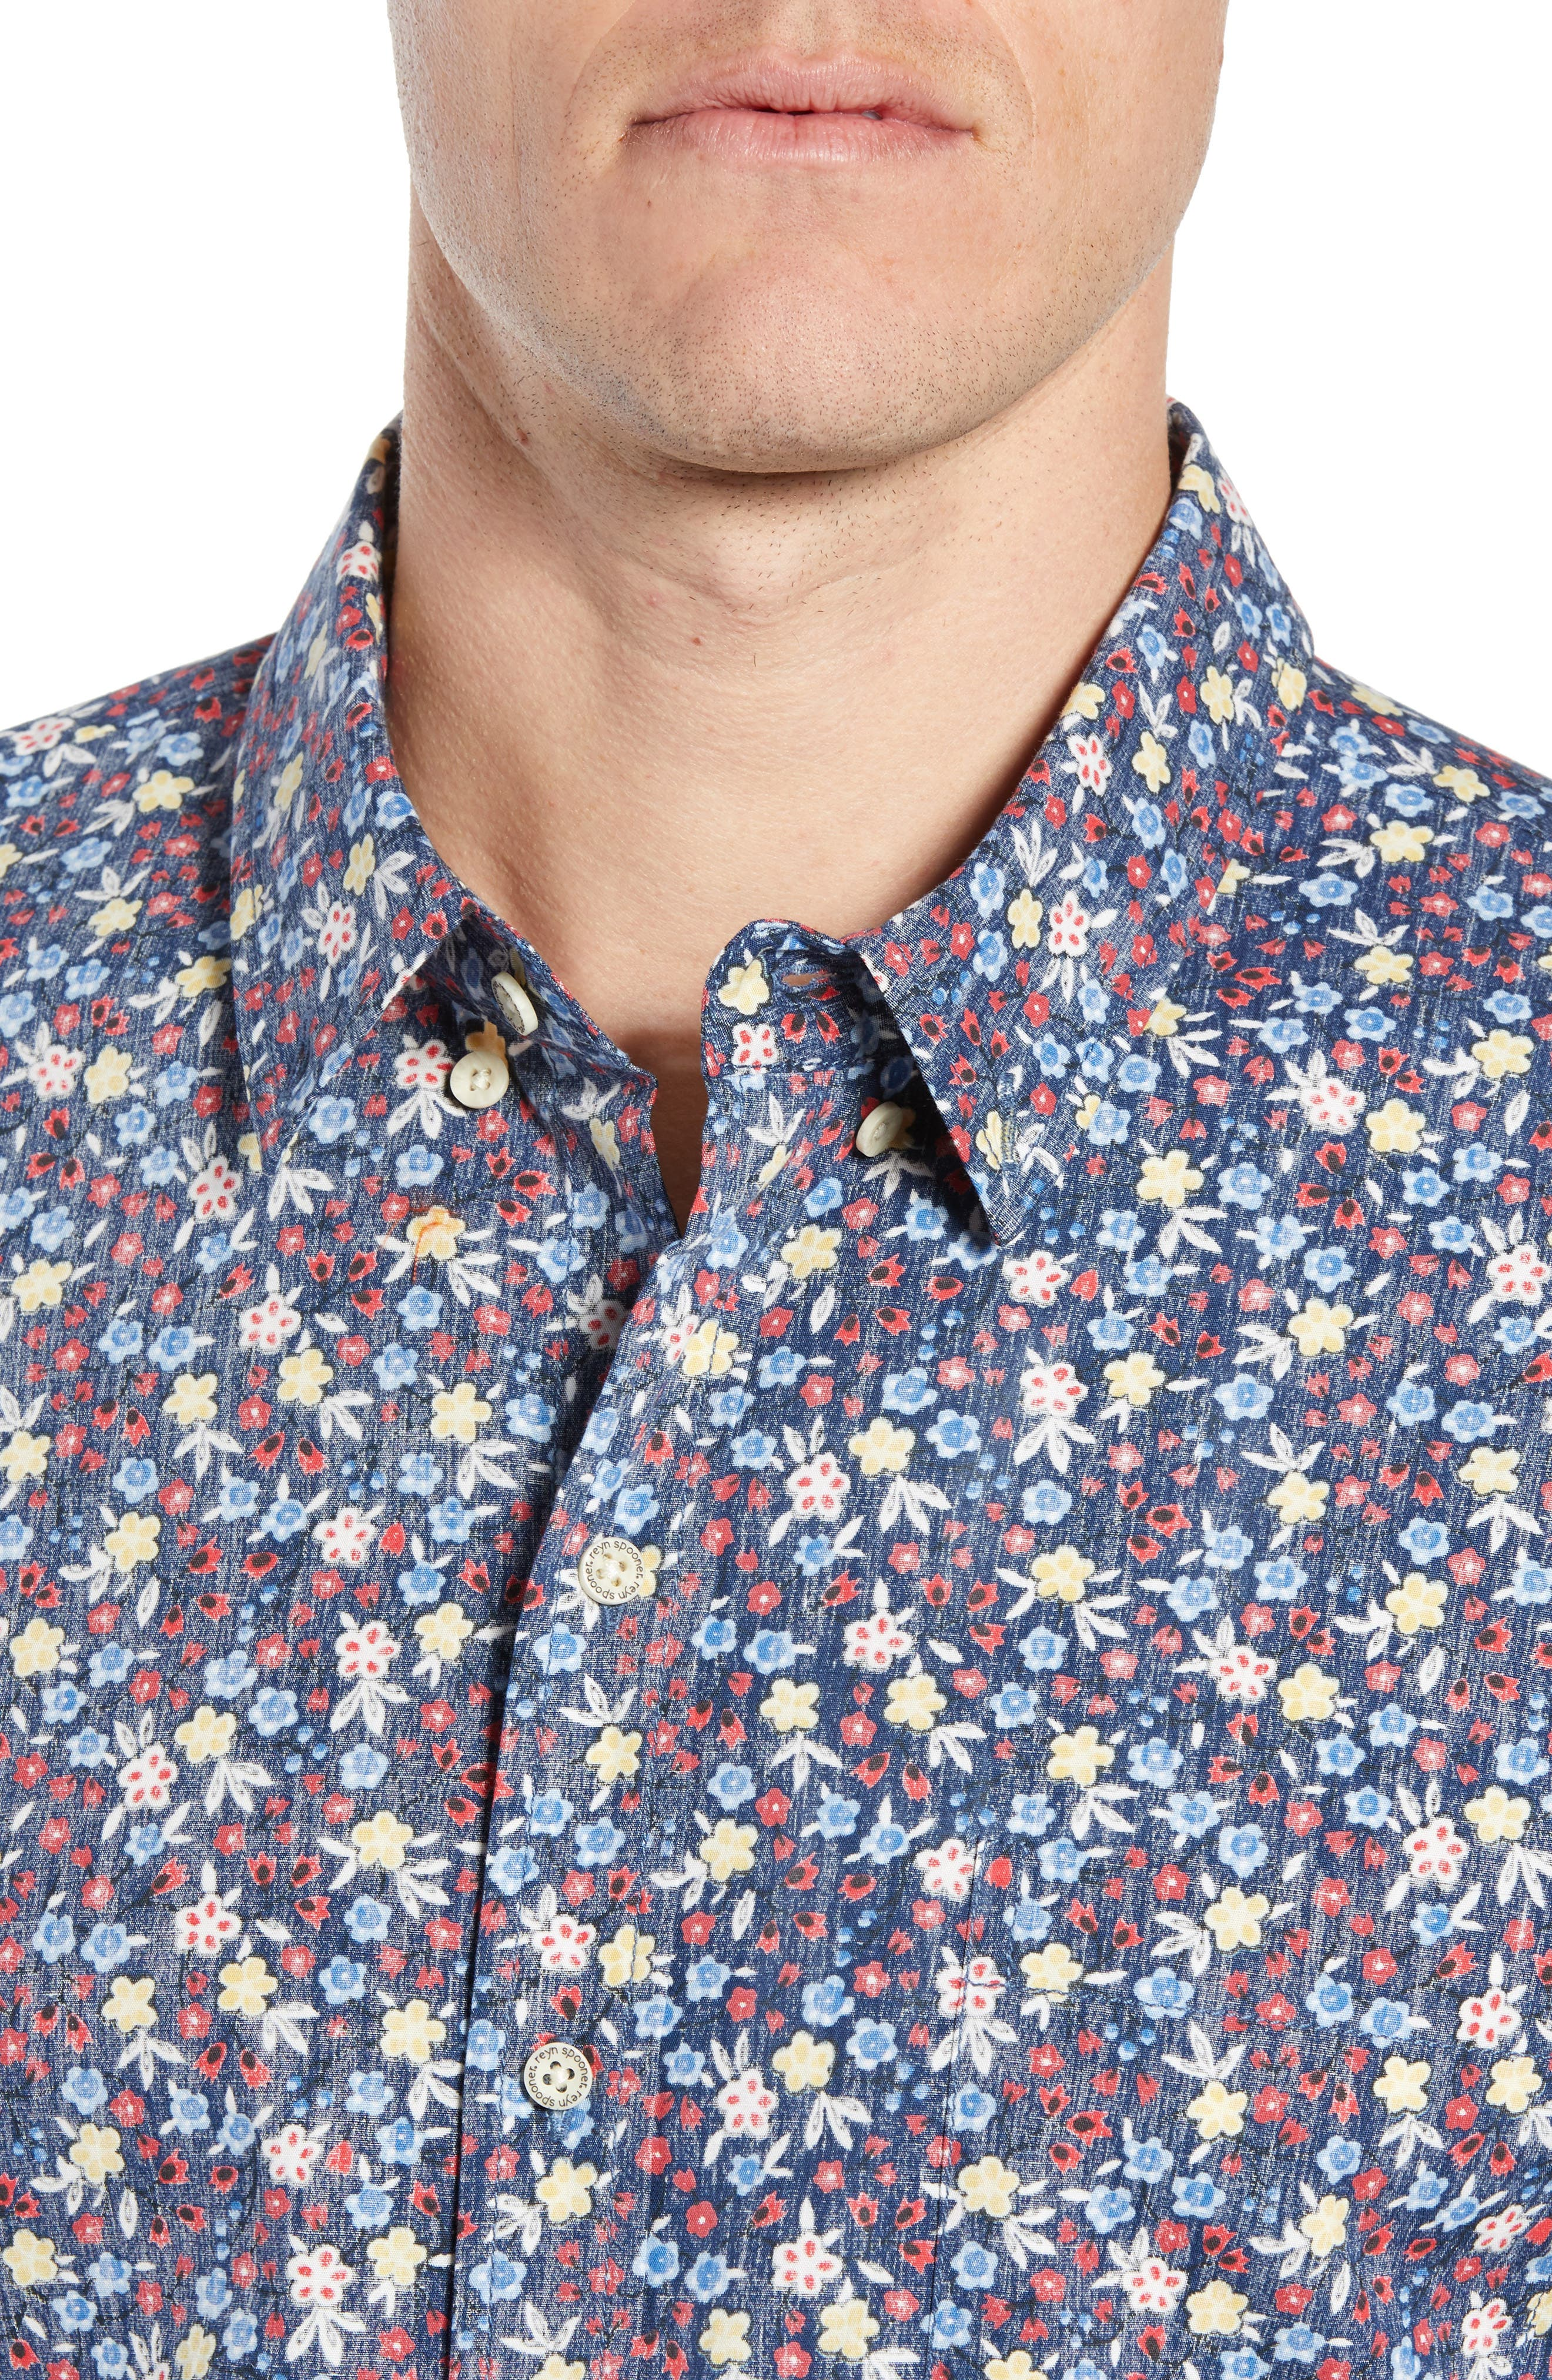 REYN SPOONER, Retro Tailored Fit Sport Shirt, Alternate thumbnail 2, color, MEDIEVAL BLUE